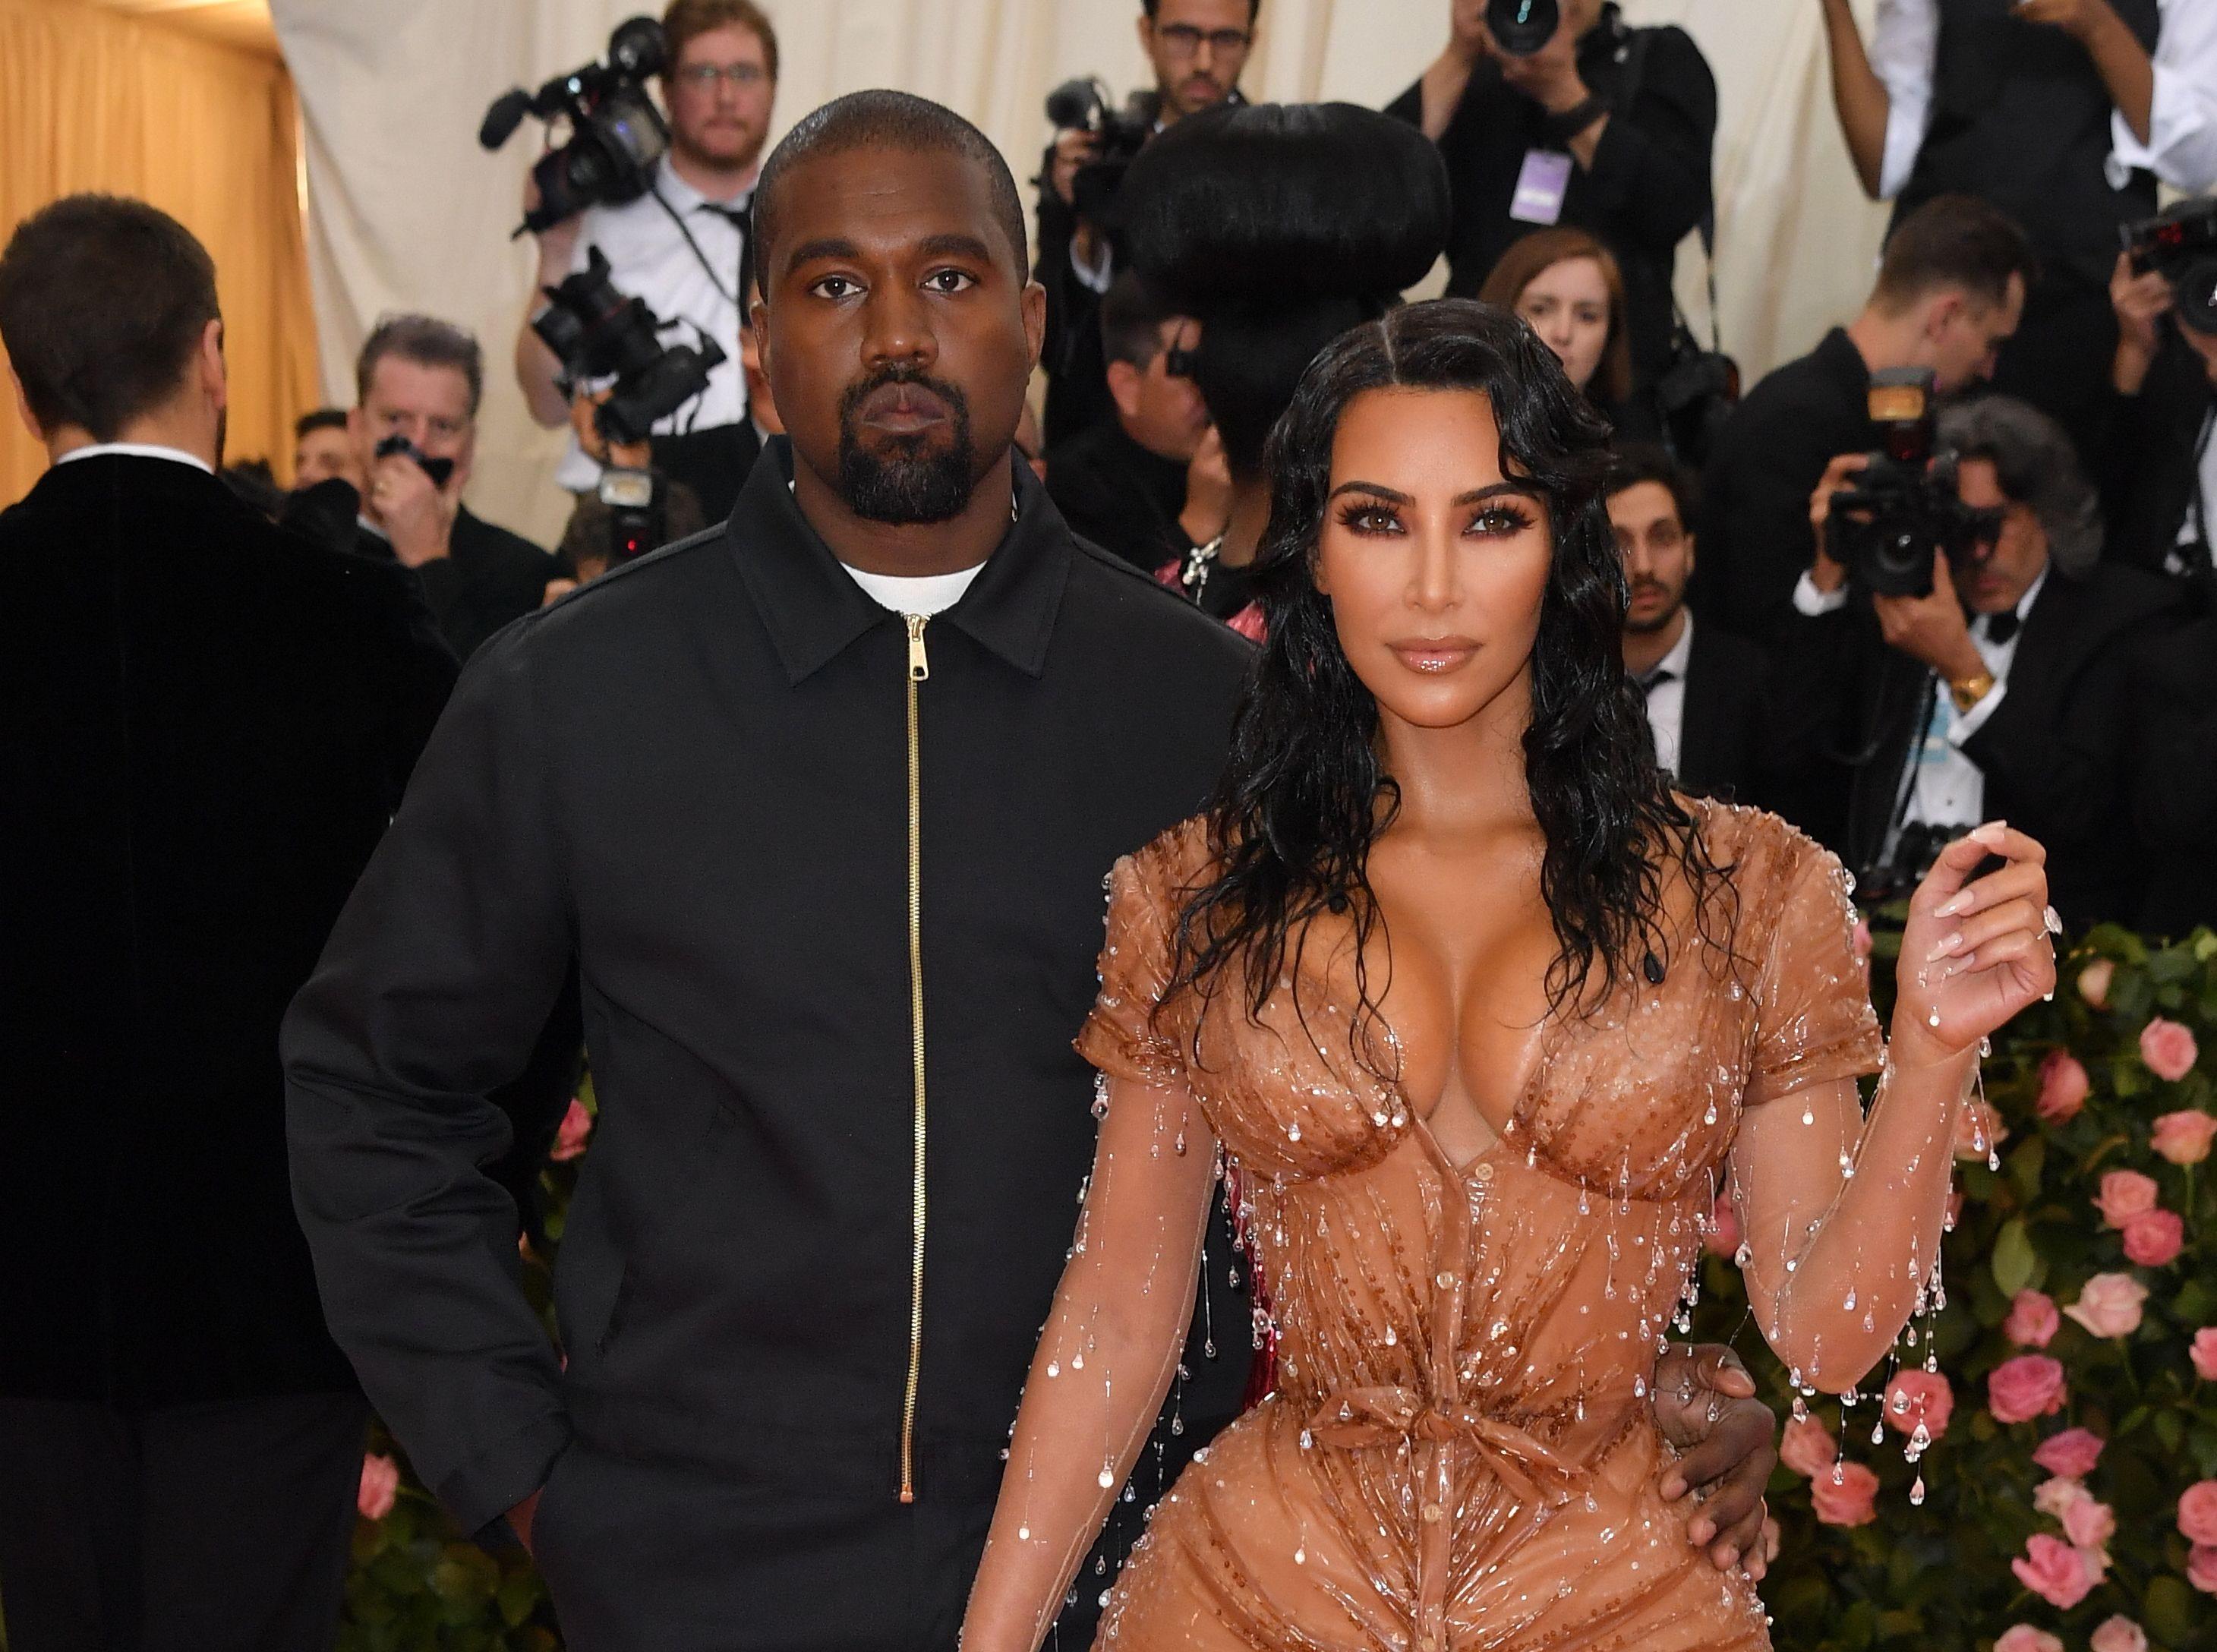 Kanye West slams Kim Kardashian s tight dress as  too sexy ; Tyler Cameron offers defense